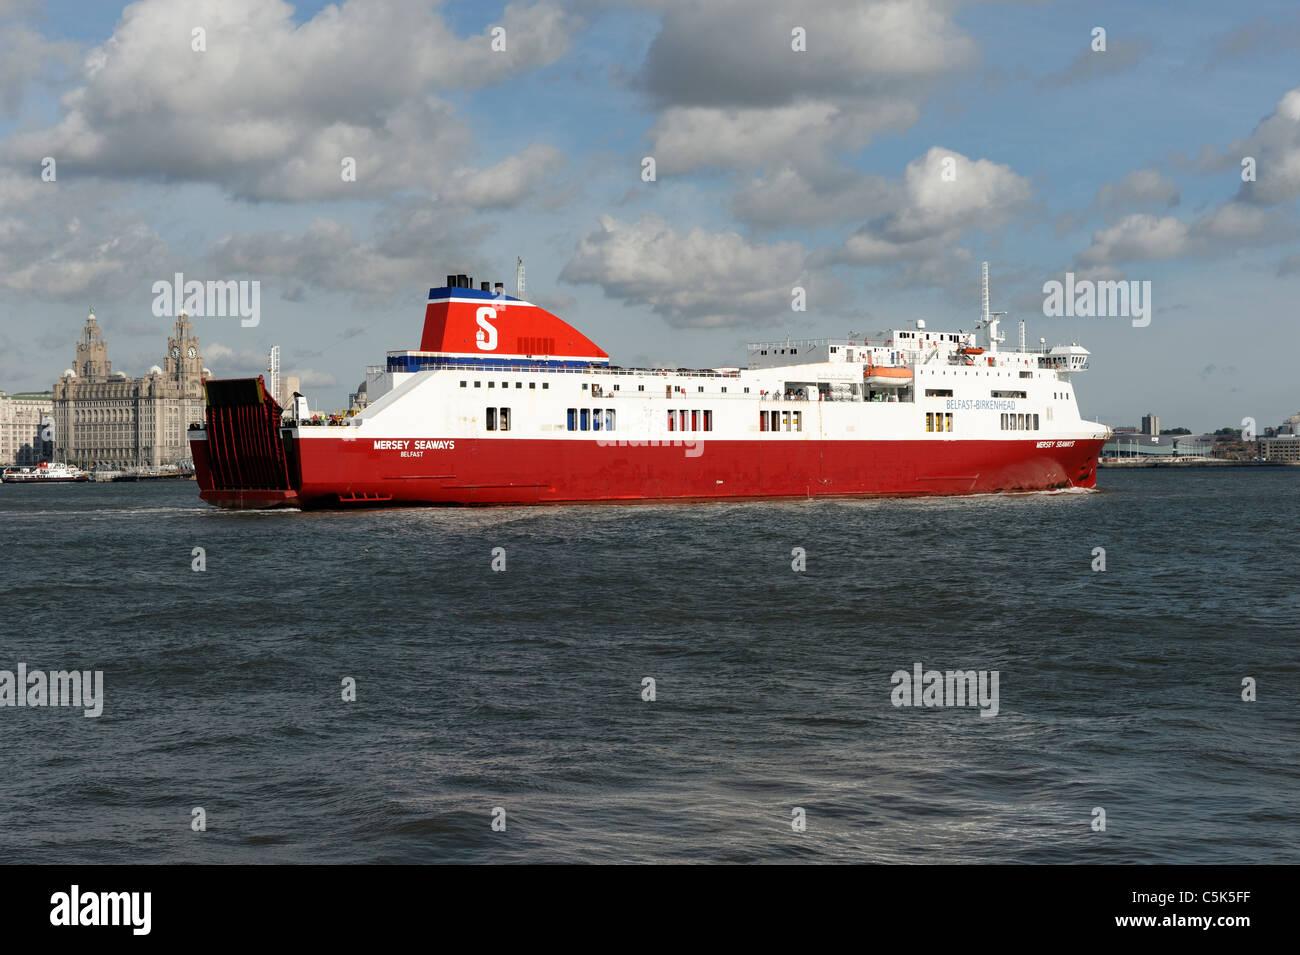 Stena Line ferry from Belfast arriving at Birkenhead, opposite Liverpool. - Stock Image